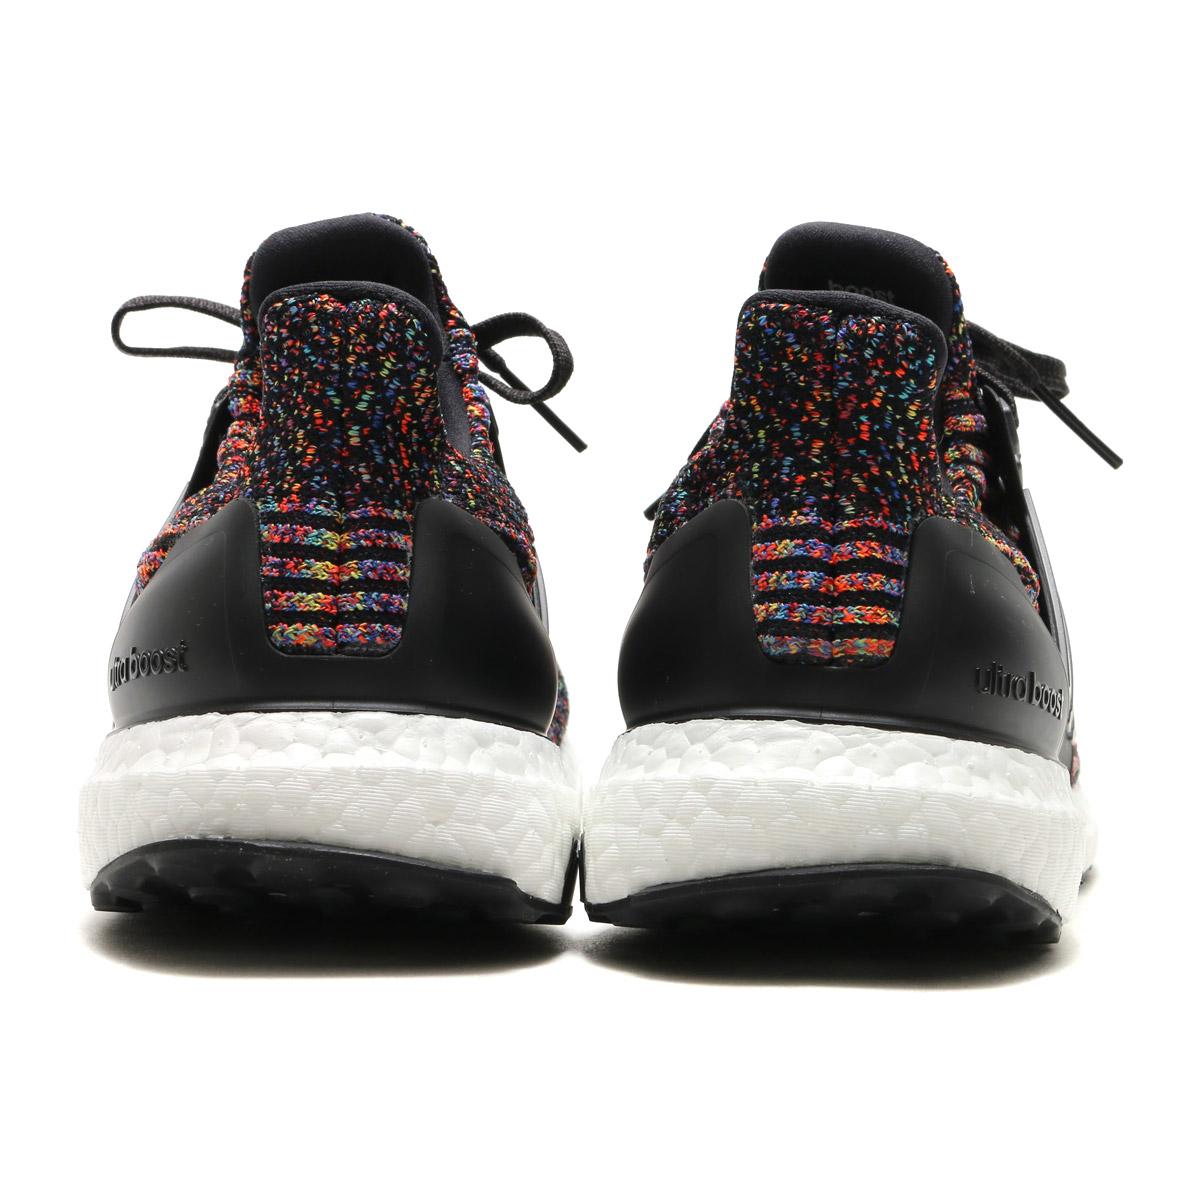 adidas Originals UltraBOOST LTD (아디다스오리지나르스퓨아브스트) (CORE BLACK/CORE BLACK/UTILITY BLACK) 17 SS-I